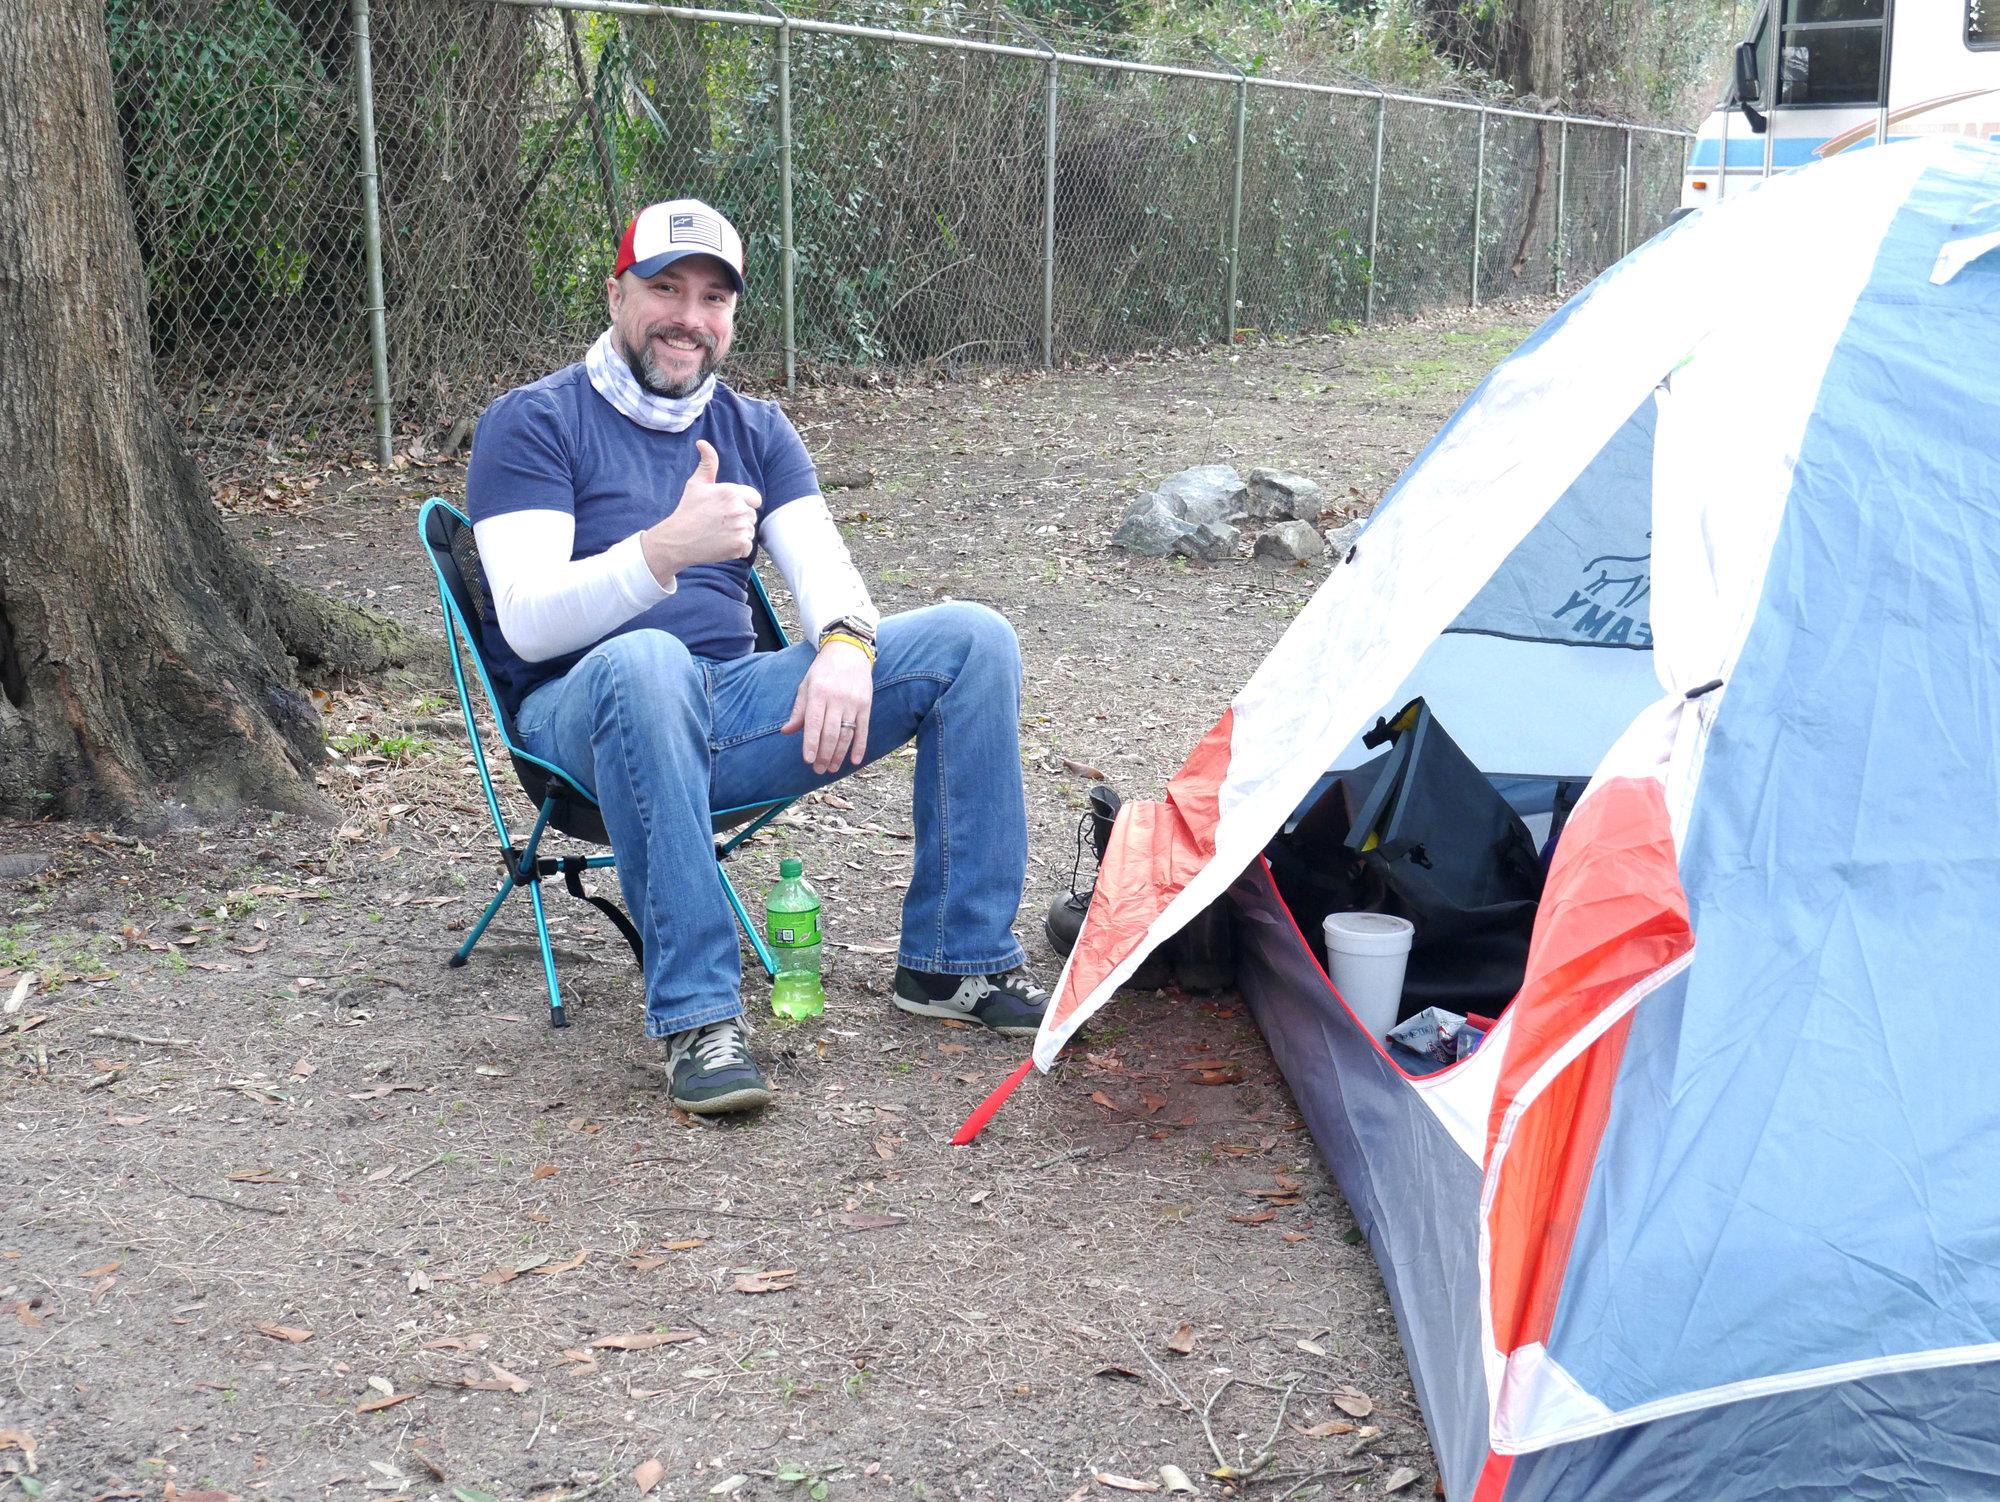 Hangin at Camp.jpg